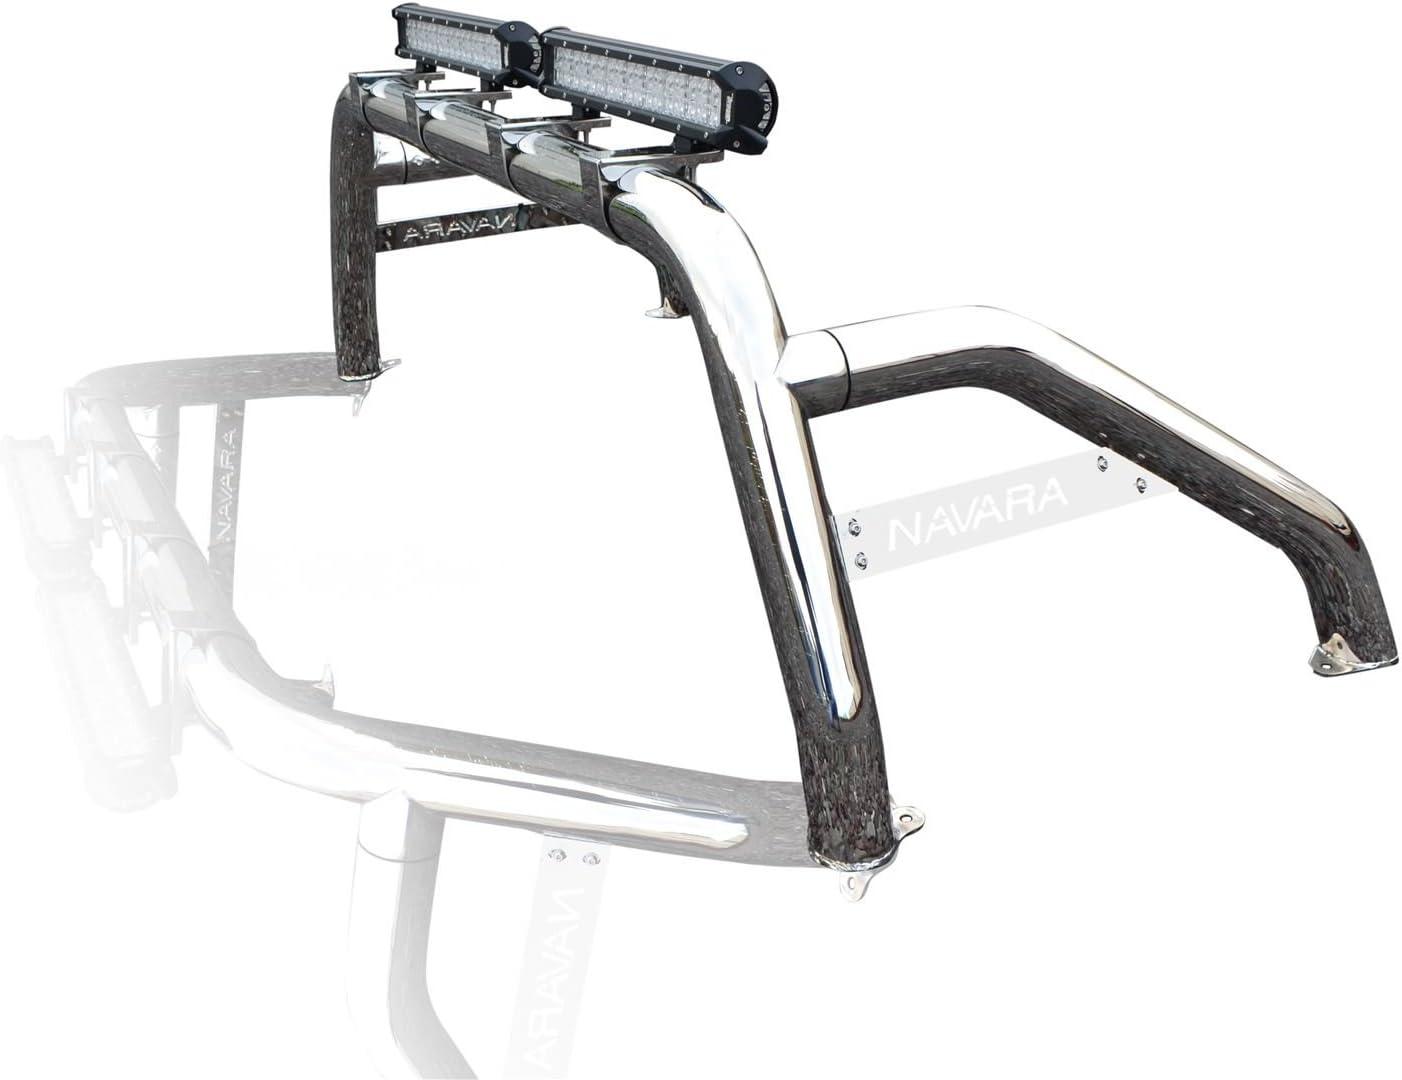 Fitting Kit Bragan BRA4812519 4x4 Chrome Stainless Steel Sport Rollbar Roll Bar LED Spot Bar